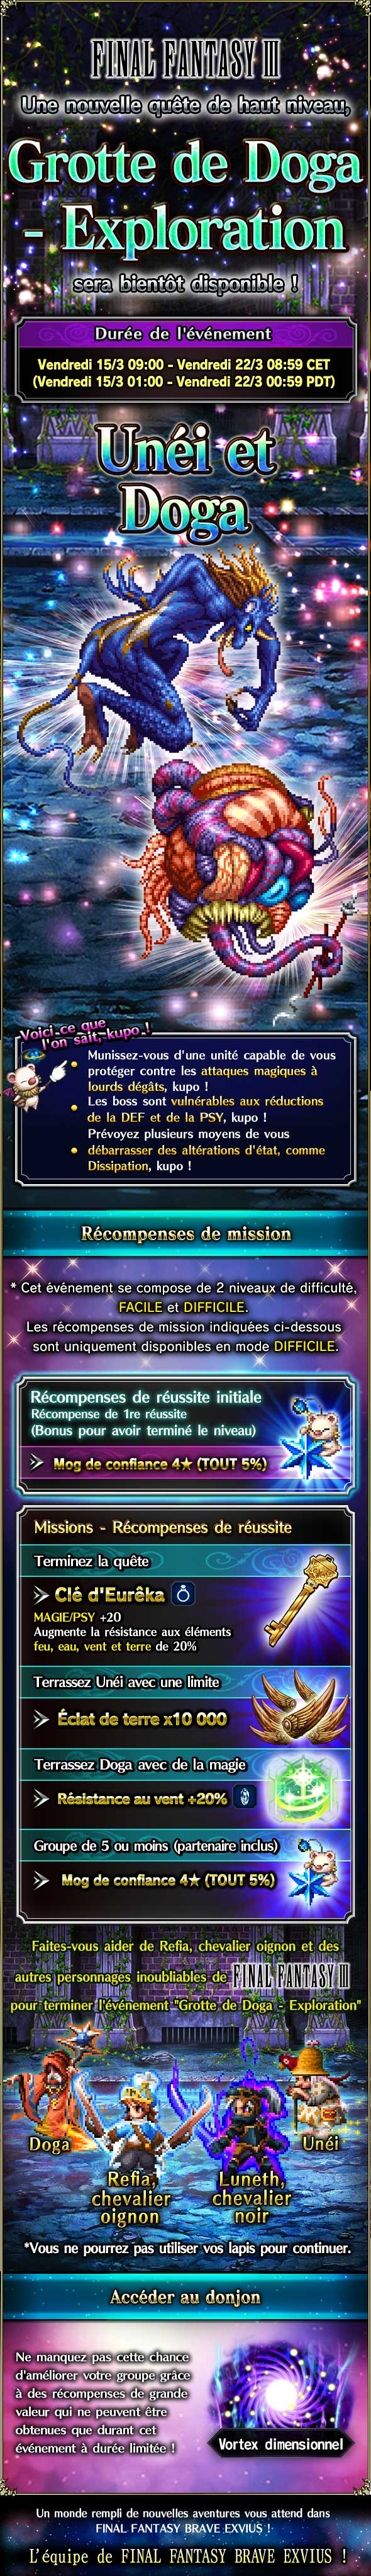 Trial MK FFIII - Grotte de Doga (Exploration) - du 15/03 au 29/03/19 FF3Exploration